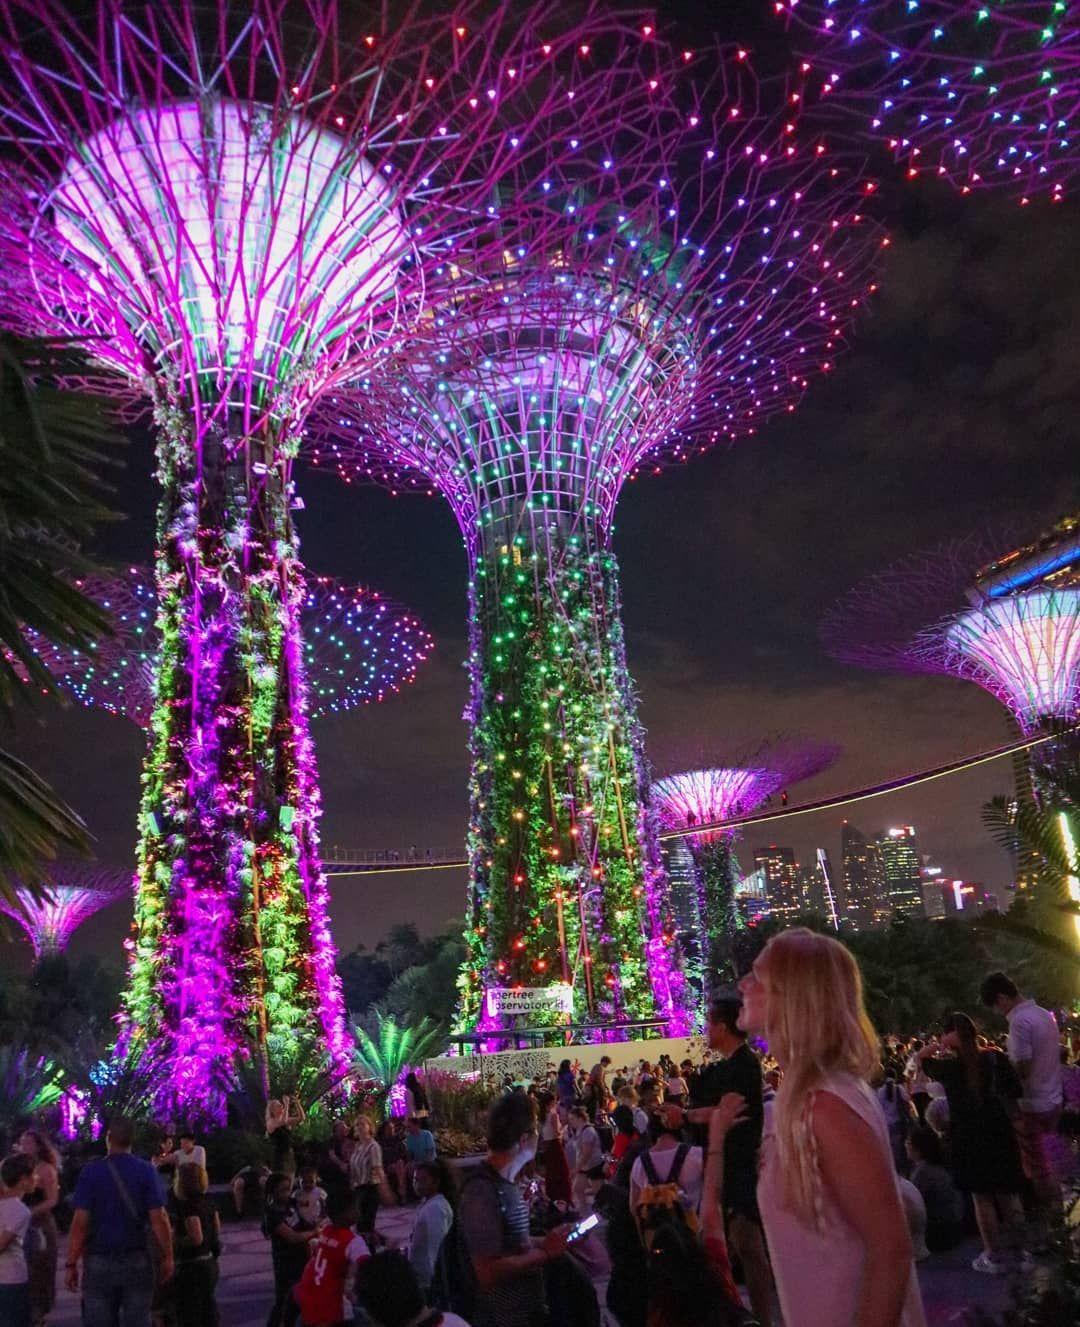 0aa945cf383d92b365e92dfbfe8cac71 - Marina Bay Gardens Light Show Time